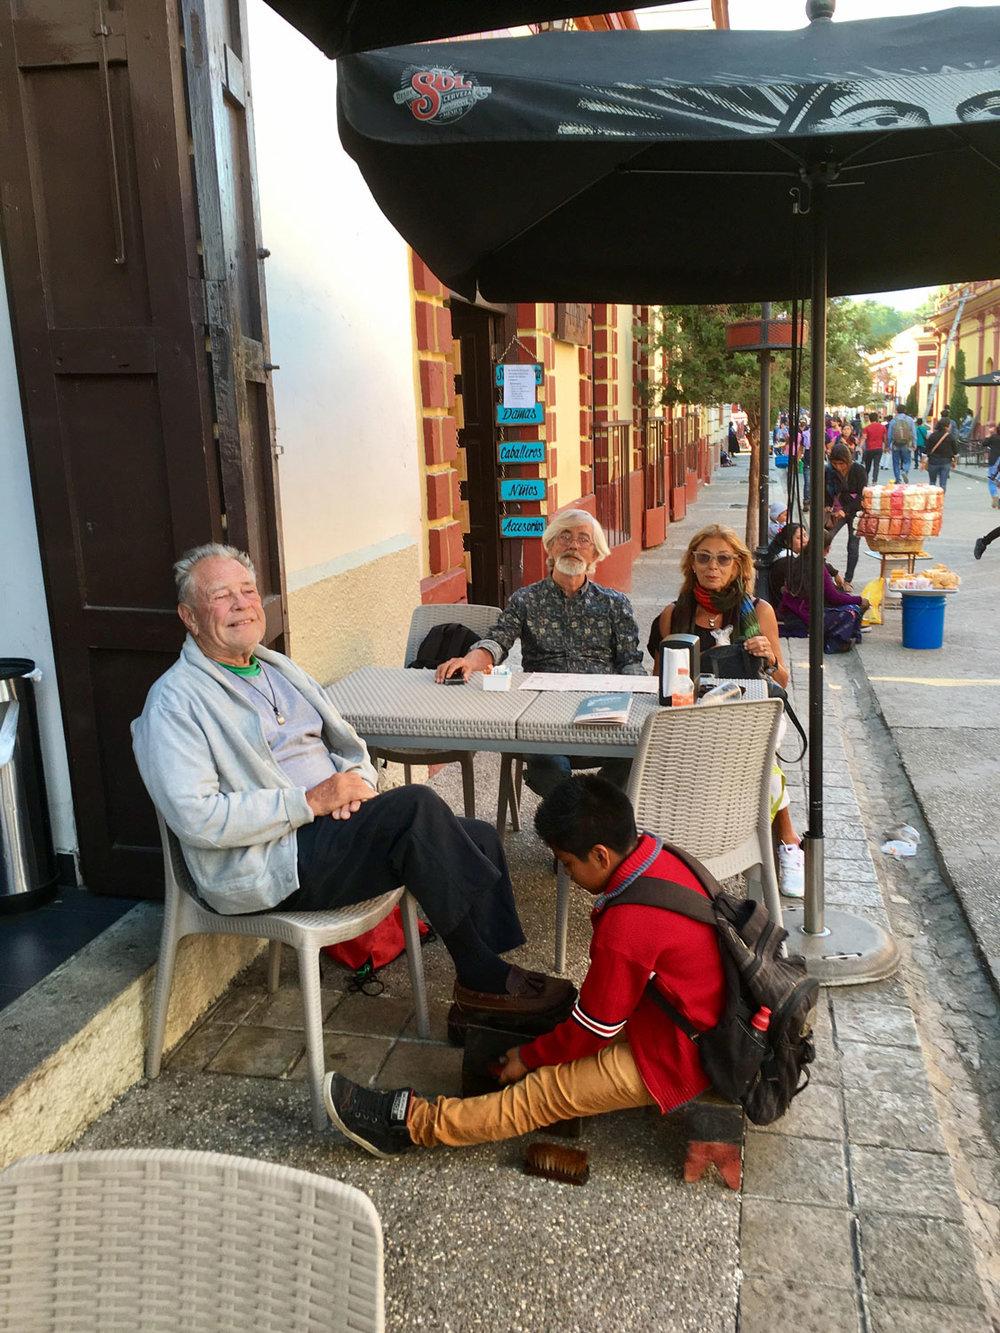 Hammocks_and_Ruins_Blog_Riviera_Maya_Mexico_Travel_Discover_Explore_Musuems_San_Cristobal_Chiapas_Mexico_Cacao_Chocolate_Museum_7.jpg